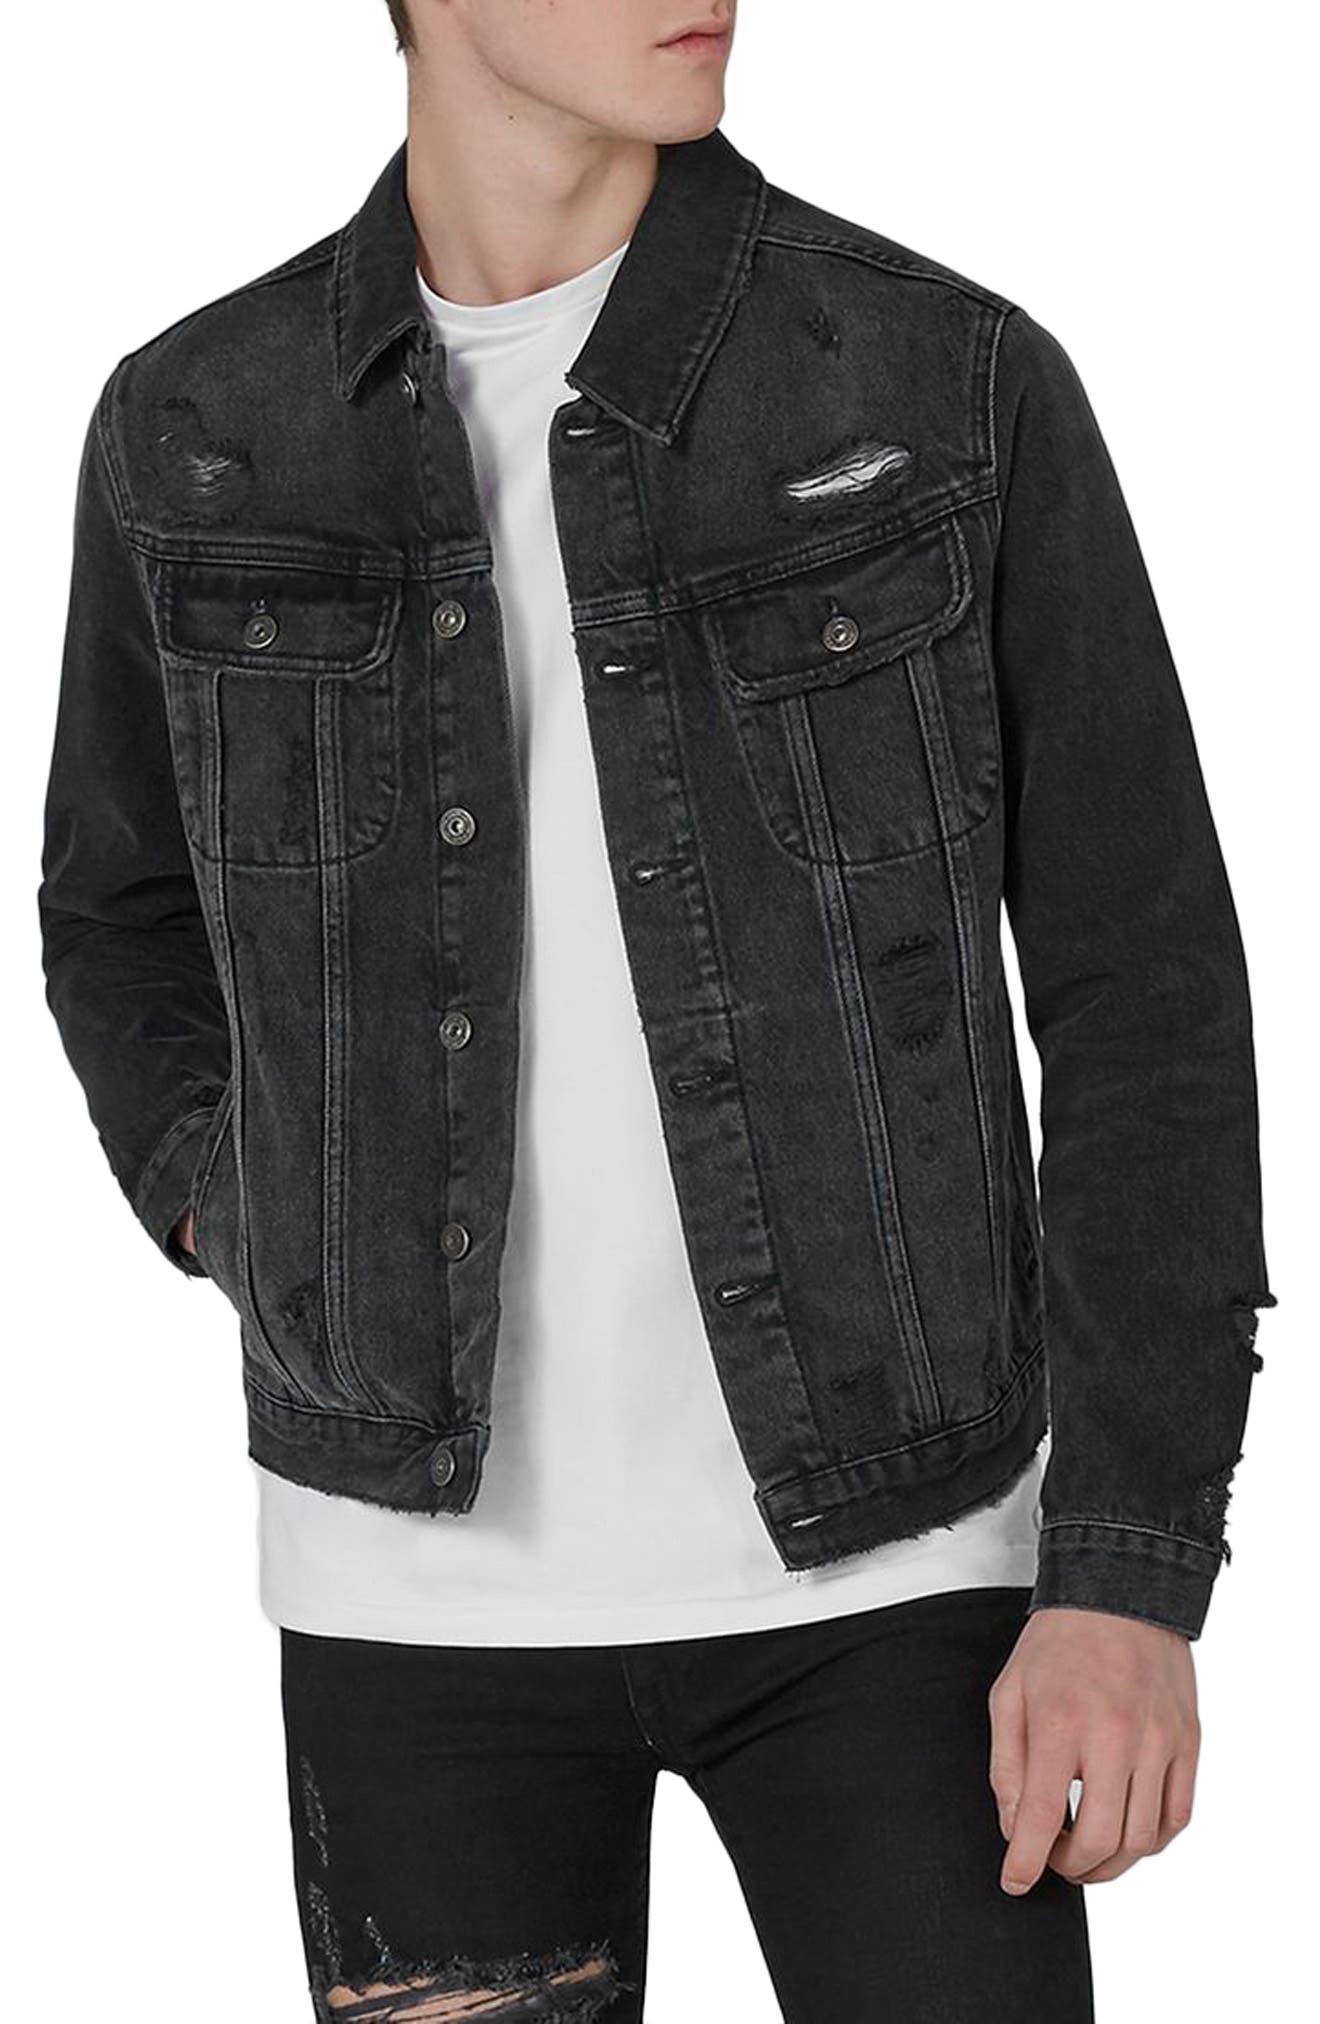 Piro Distressed Denim Jacket,                         Main,                         color,